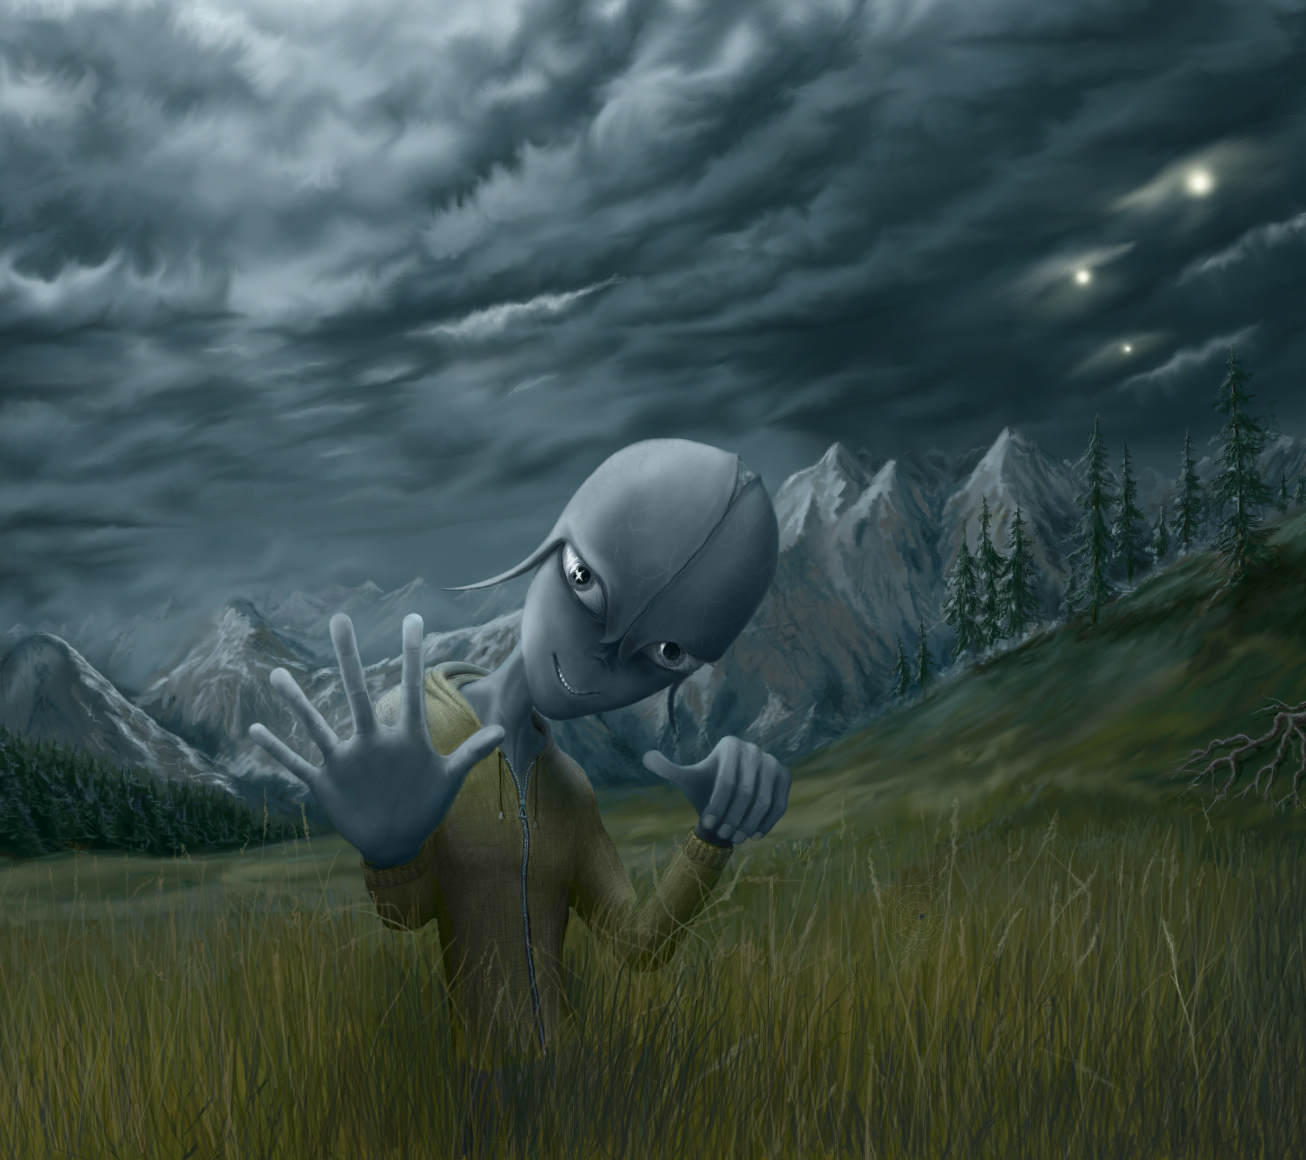 Ufo extraterrestrials piratebay exposed tube